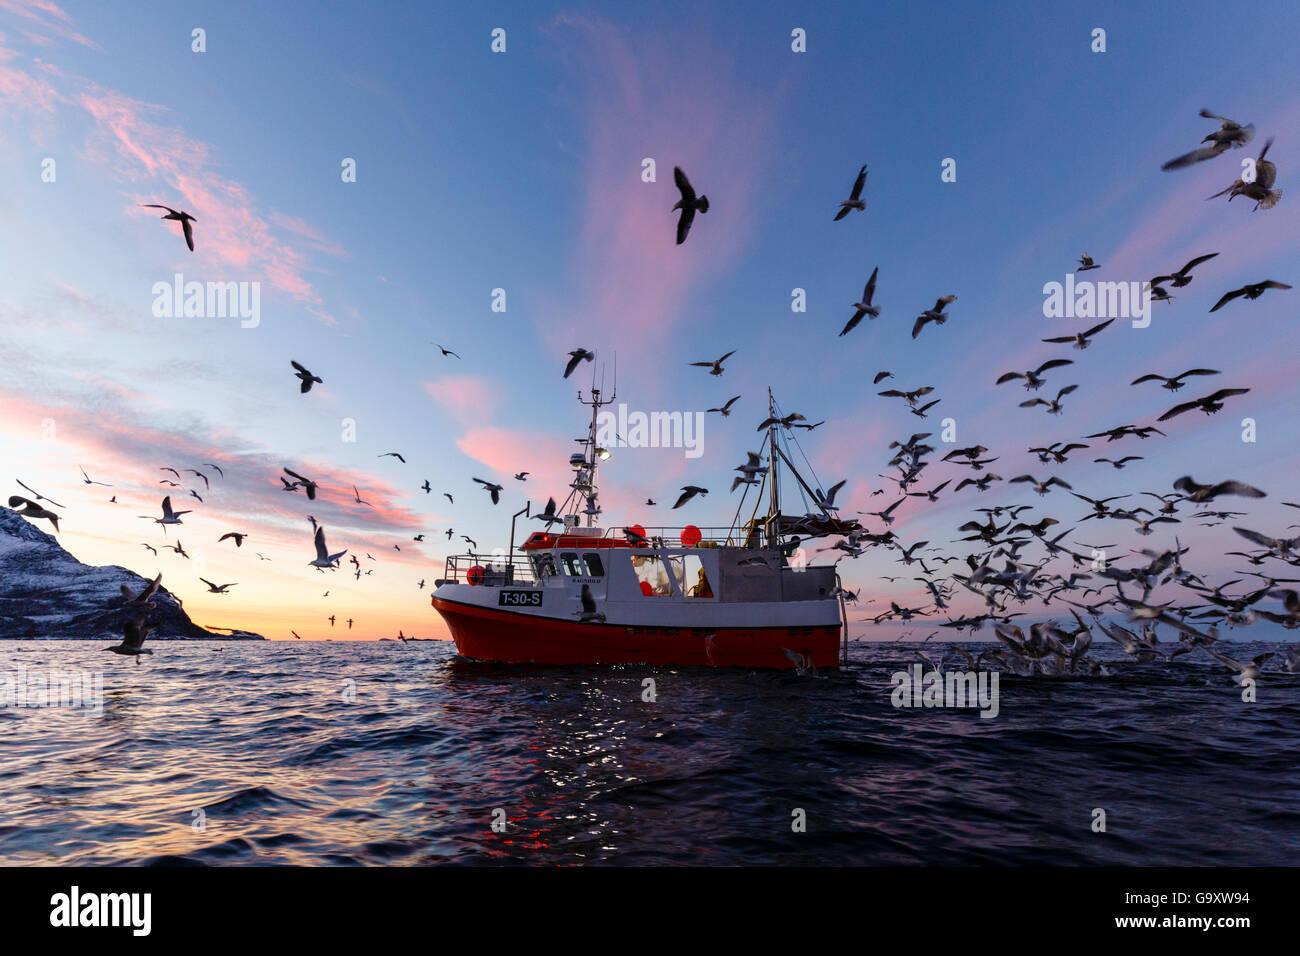 Gulls (Laridae) following small fishing boat, Kvaloya, Troms, Norway, November. - Stock Image